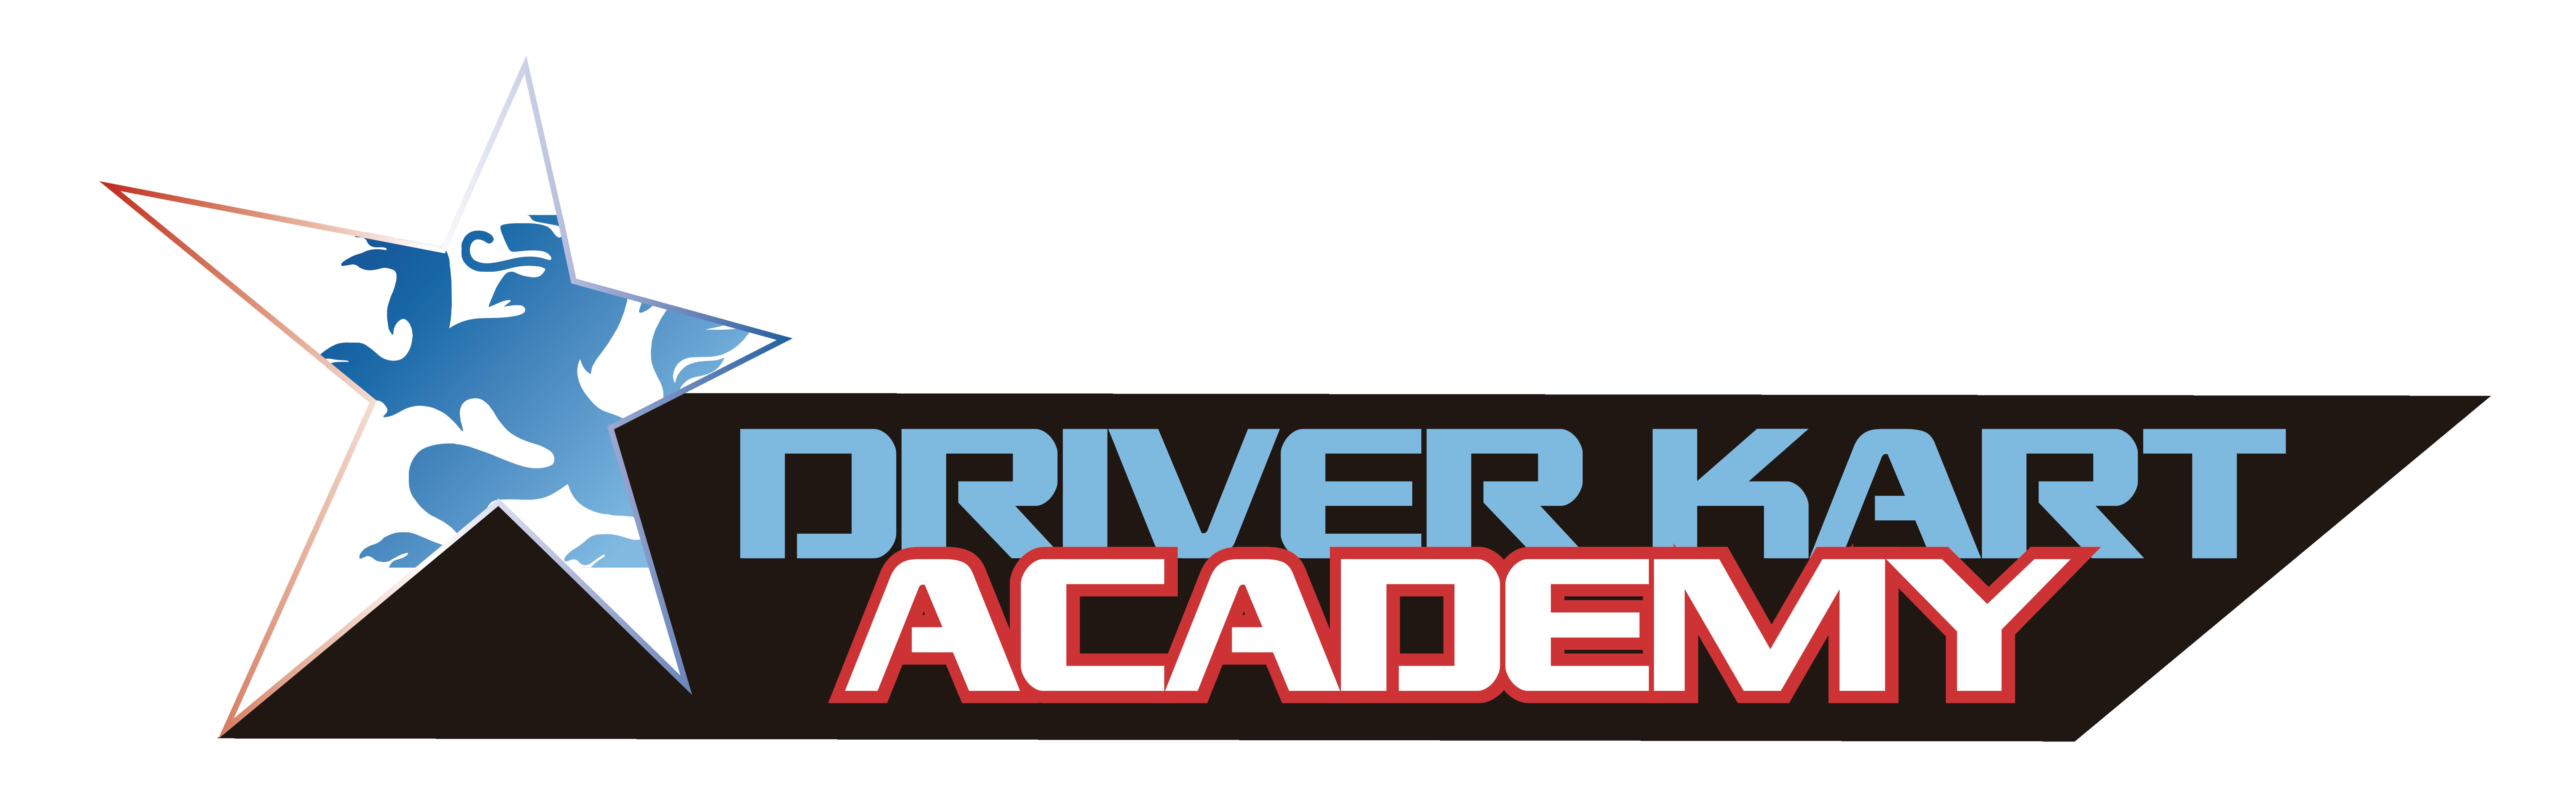 Driver Kart Academy